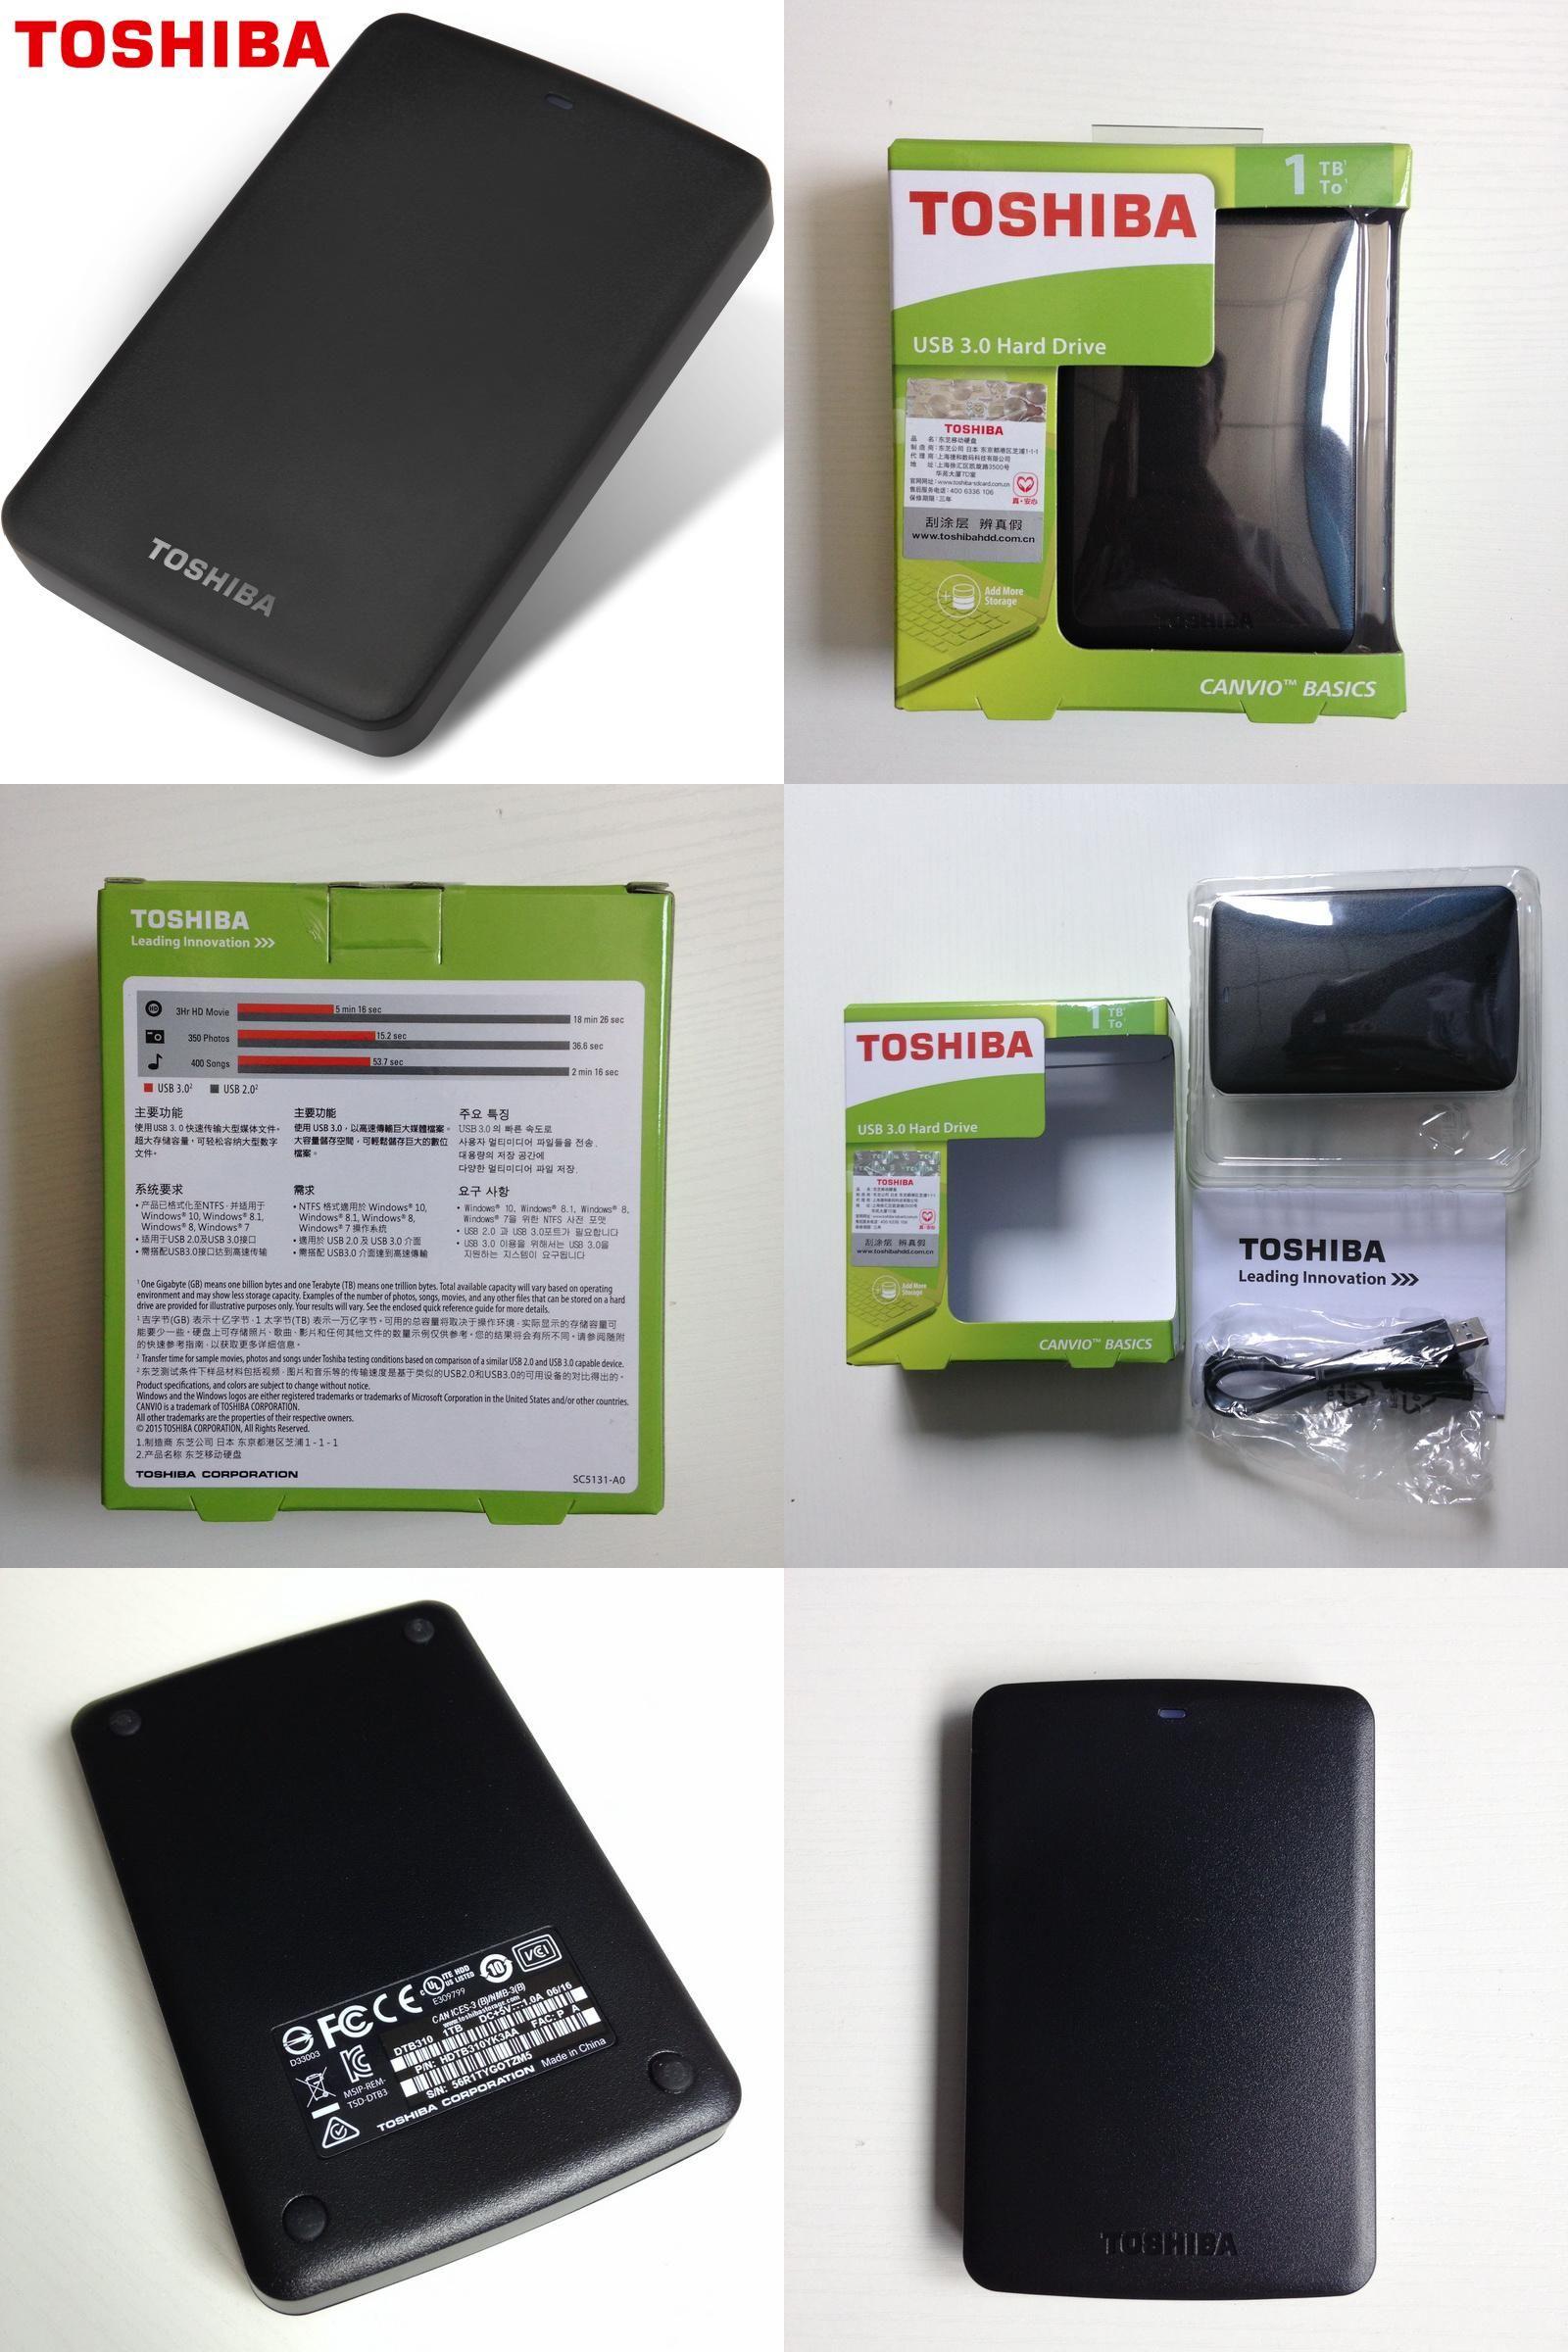 Visit To Buy Toshiba 1tb External Hdd 1000gb Hd Portable Hard Drive Hardisk Pc Internal 35 Disk Usb